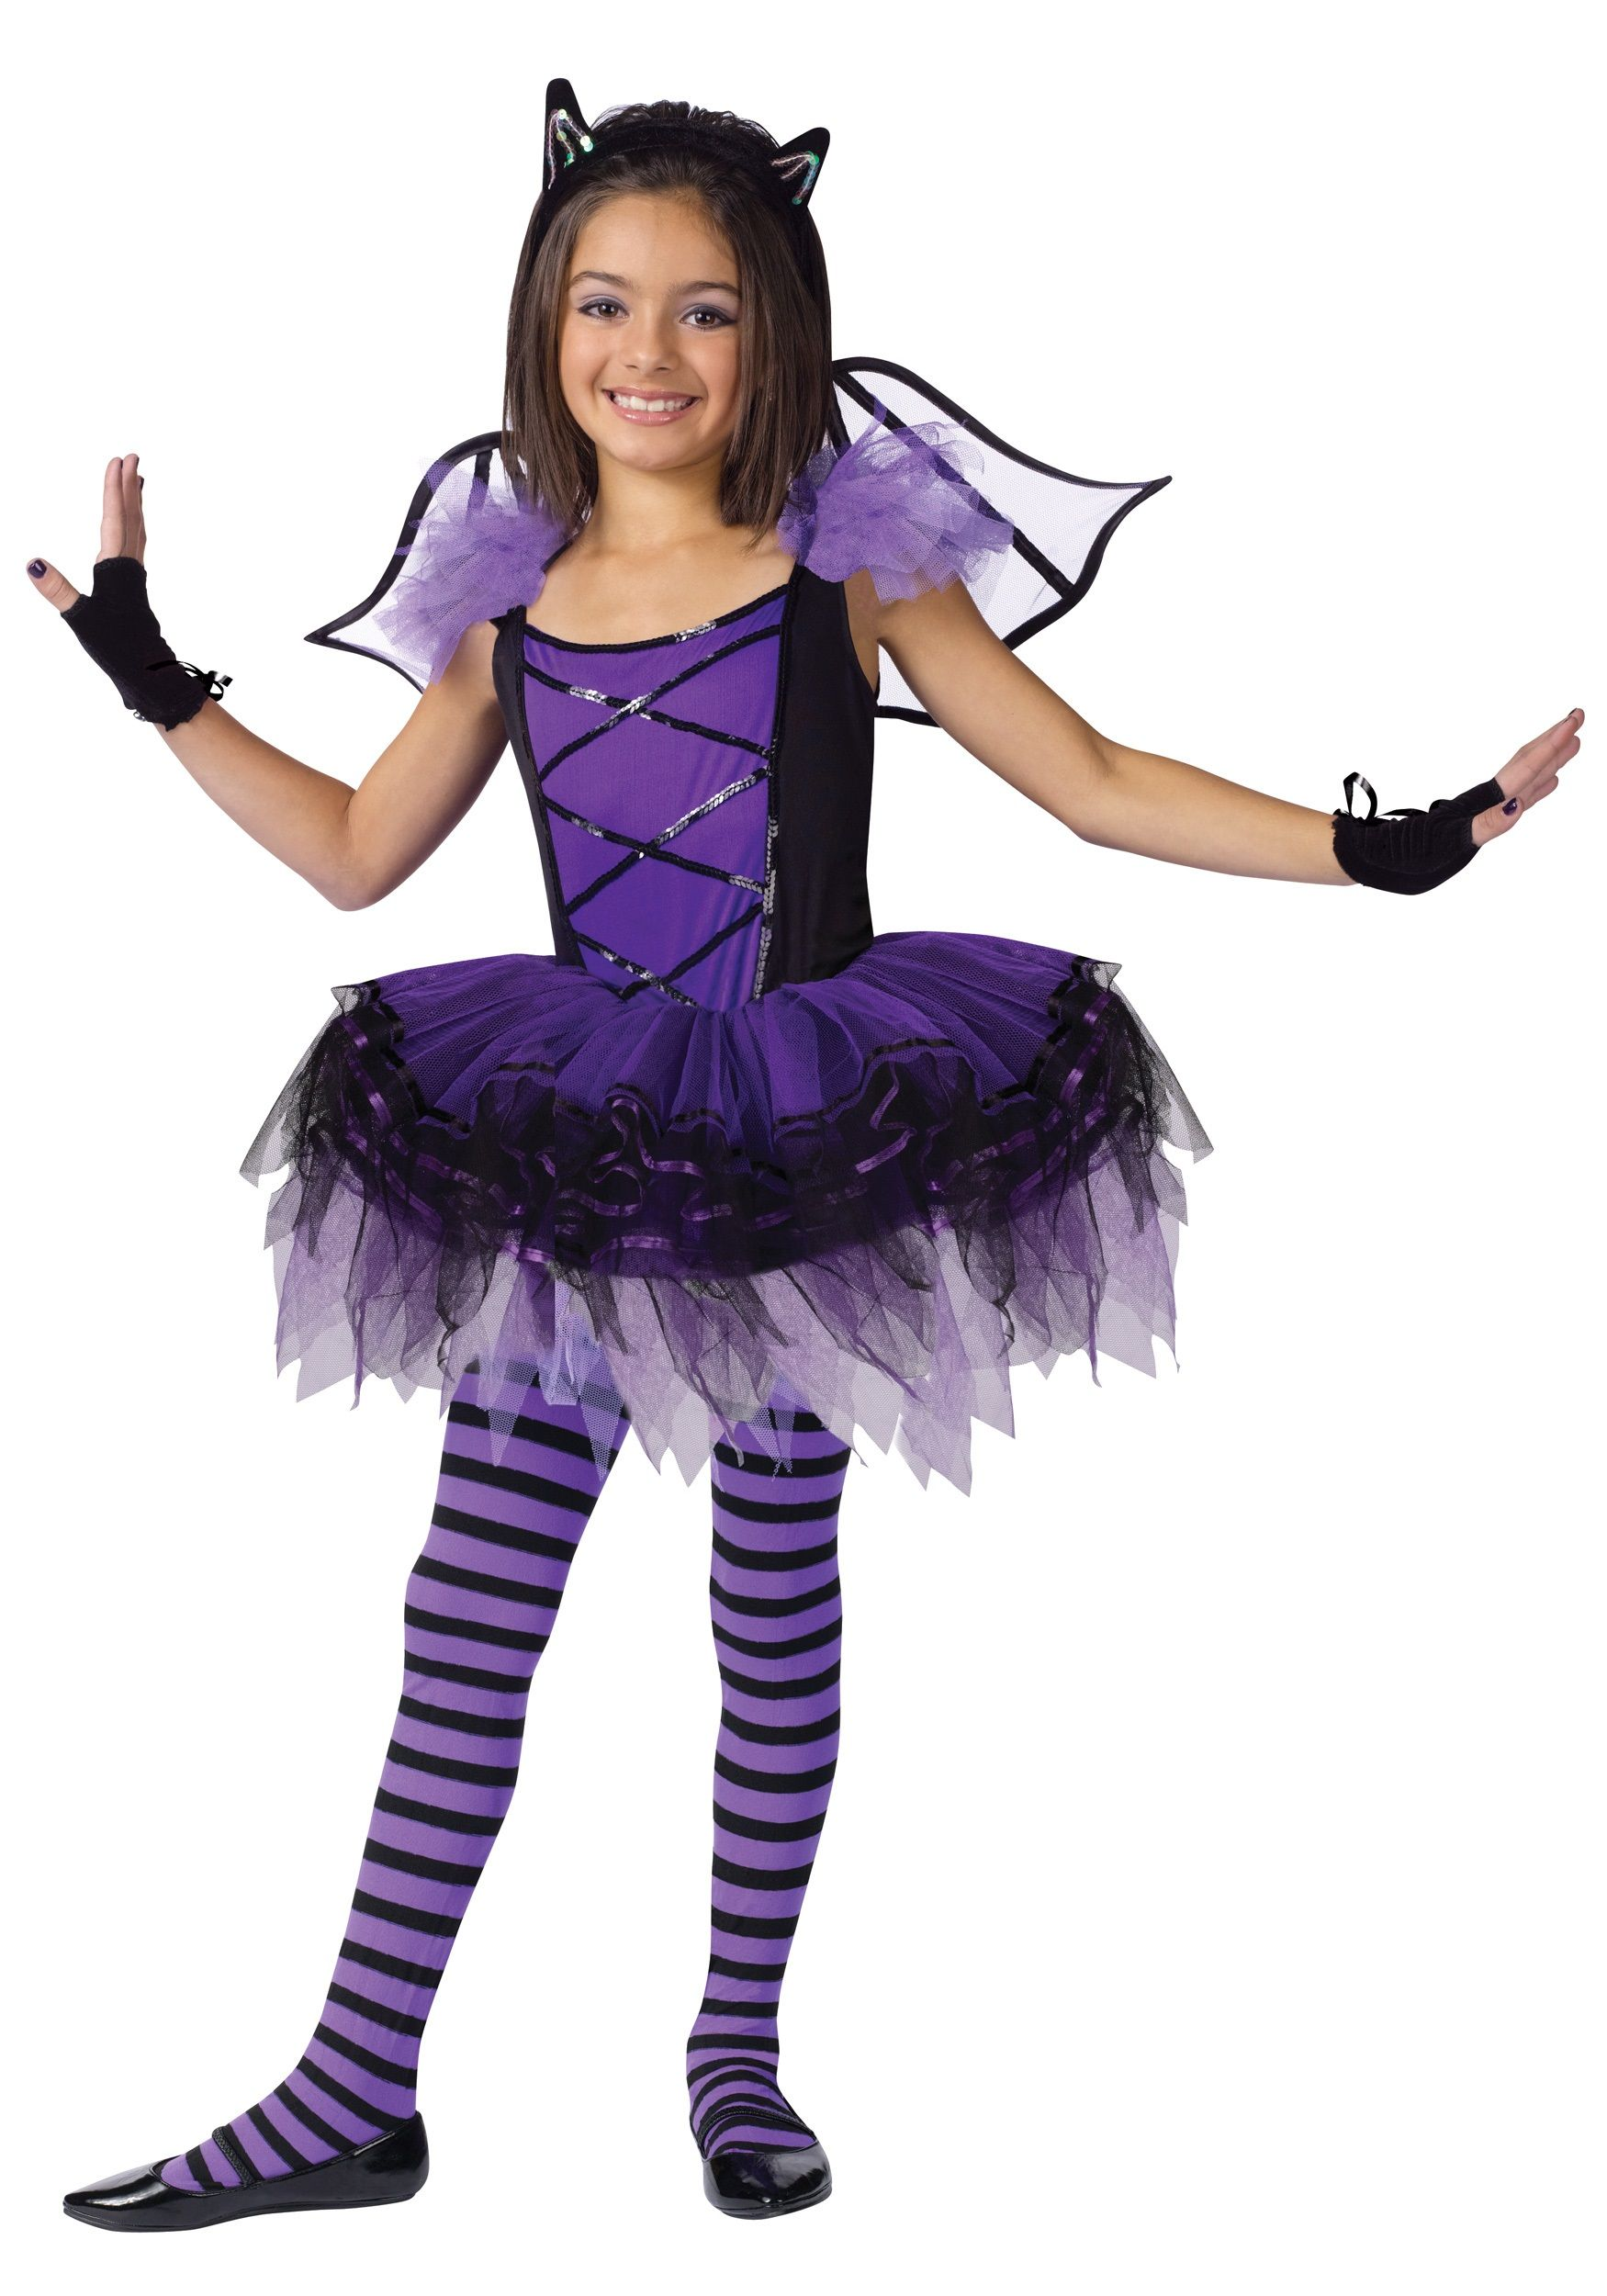 the child batarina vampire costume is a cute vampire bat halloween costume for girls the girls costume is fun for ballerina tutu style vampire halloween